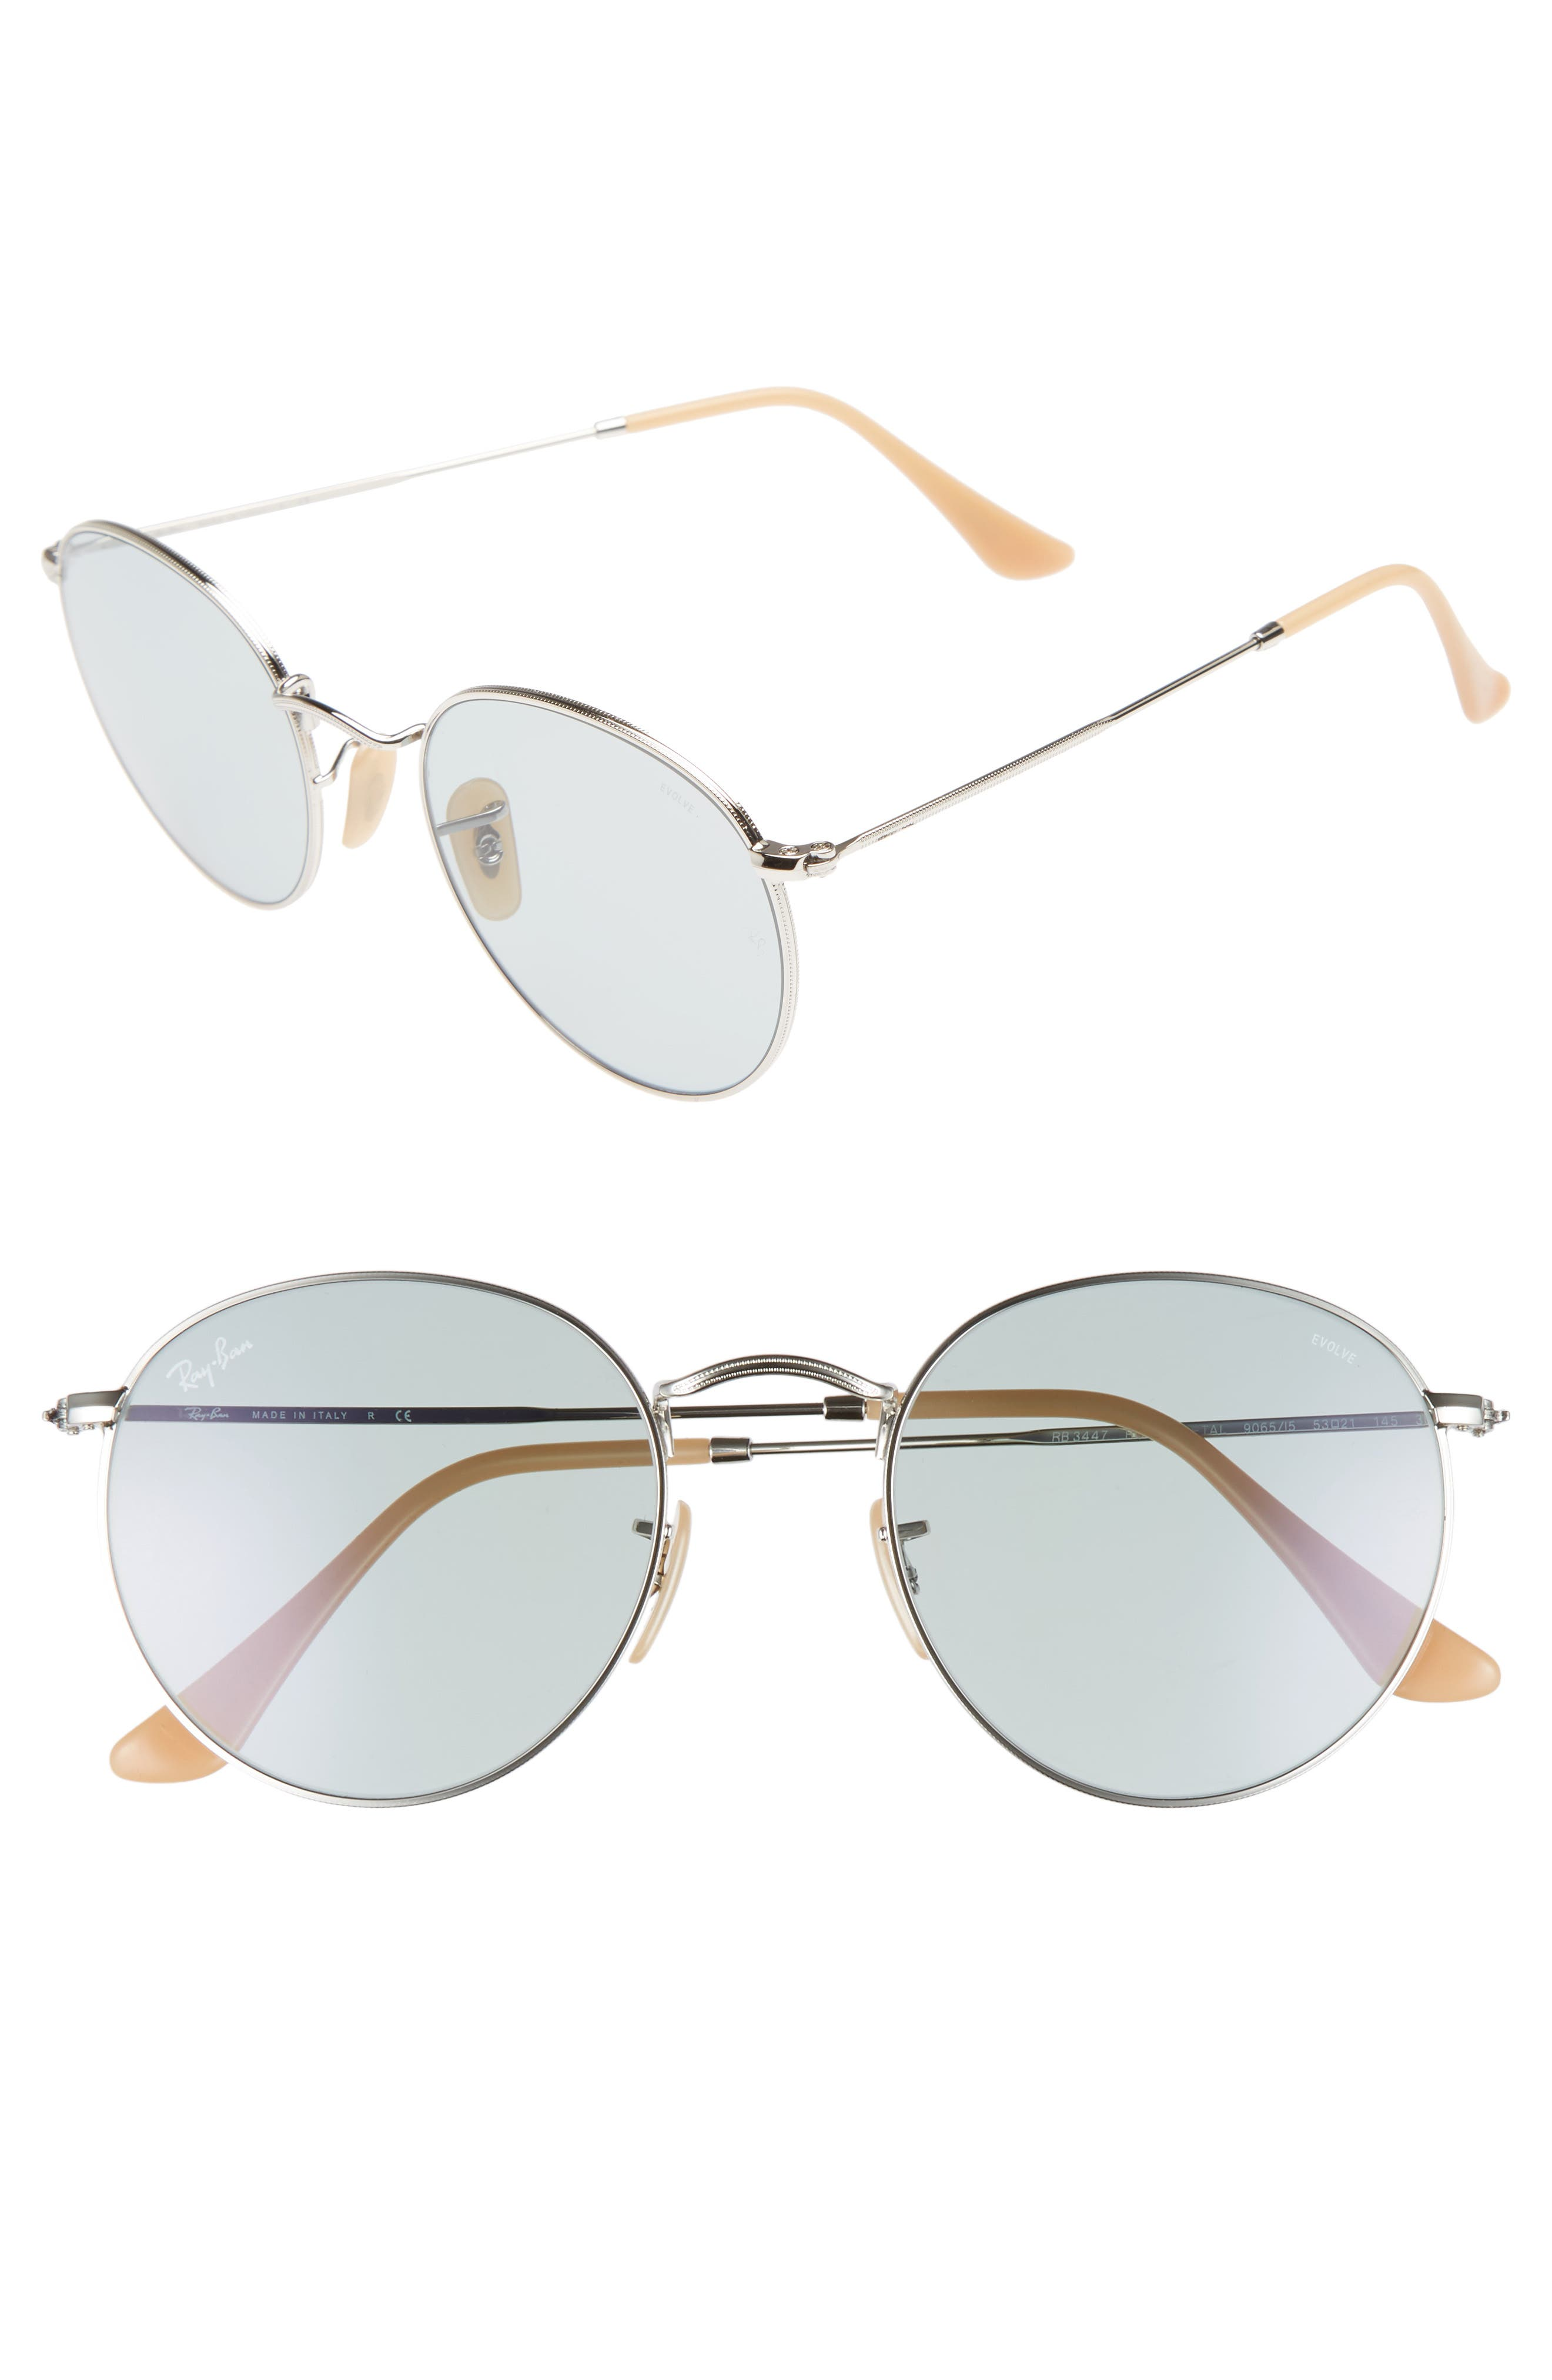 53mm Polarized Round Sunglasses,                             Main thumbnail 1, color,                             Silver Blue